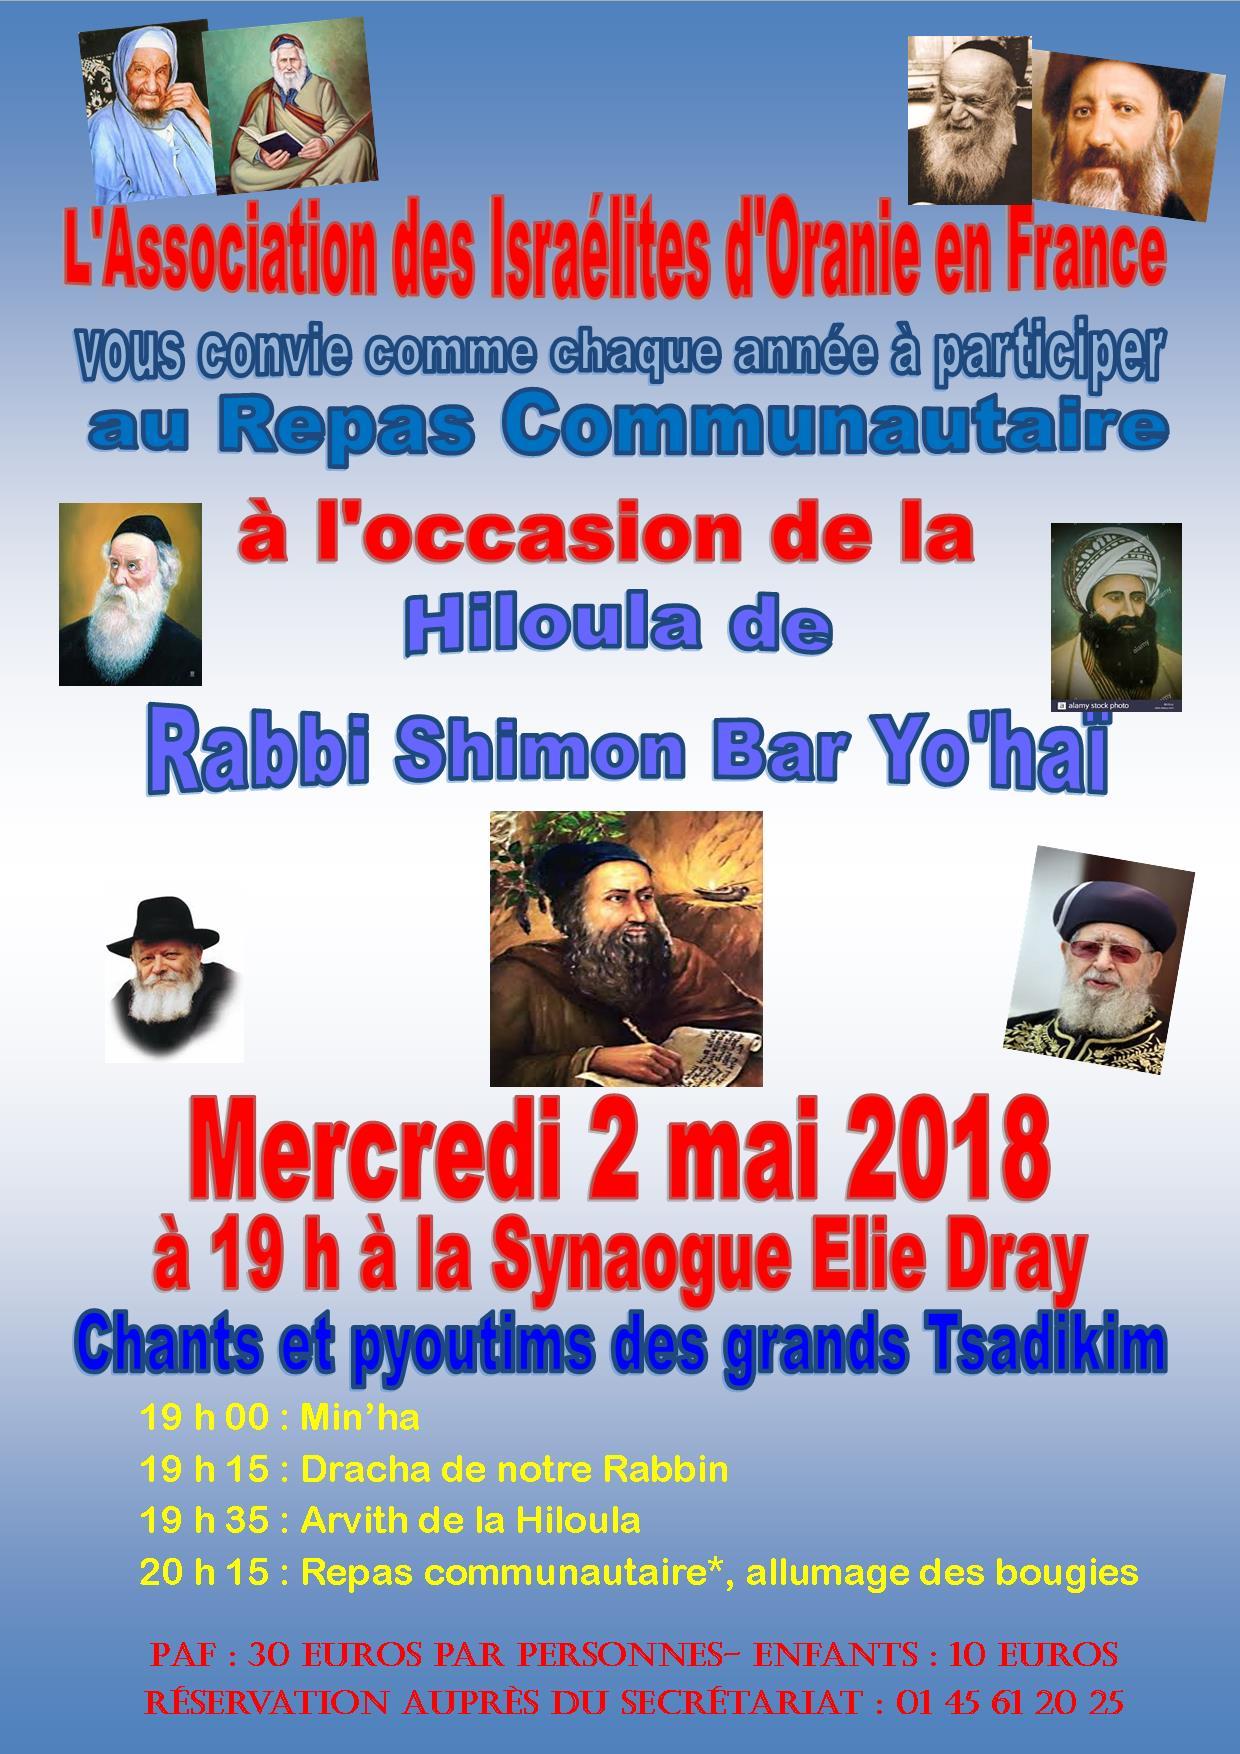 hiloula de Rabbi Shimon Bar Yohai 2018 ok